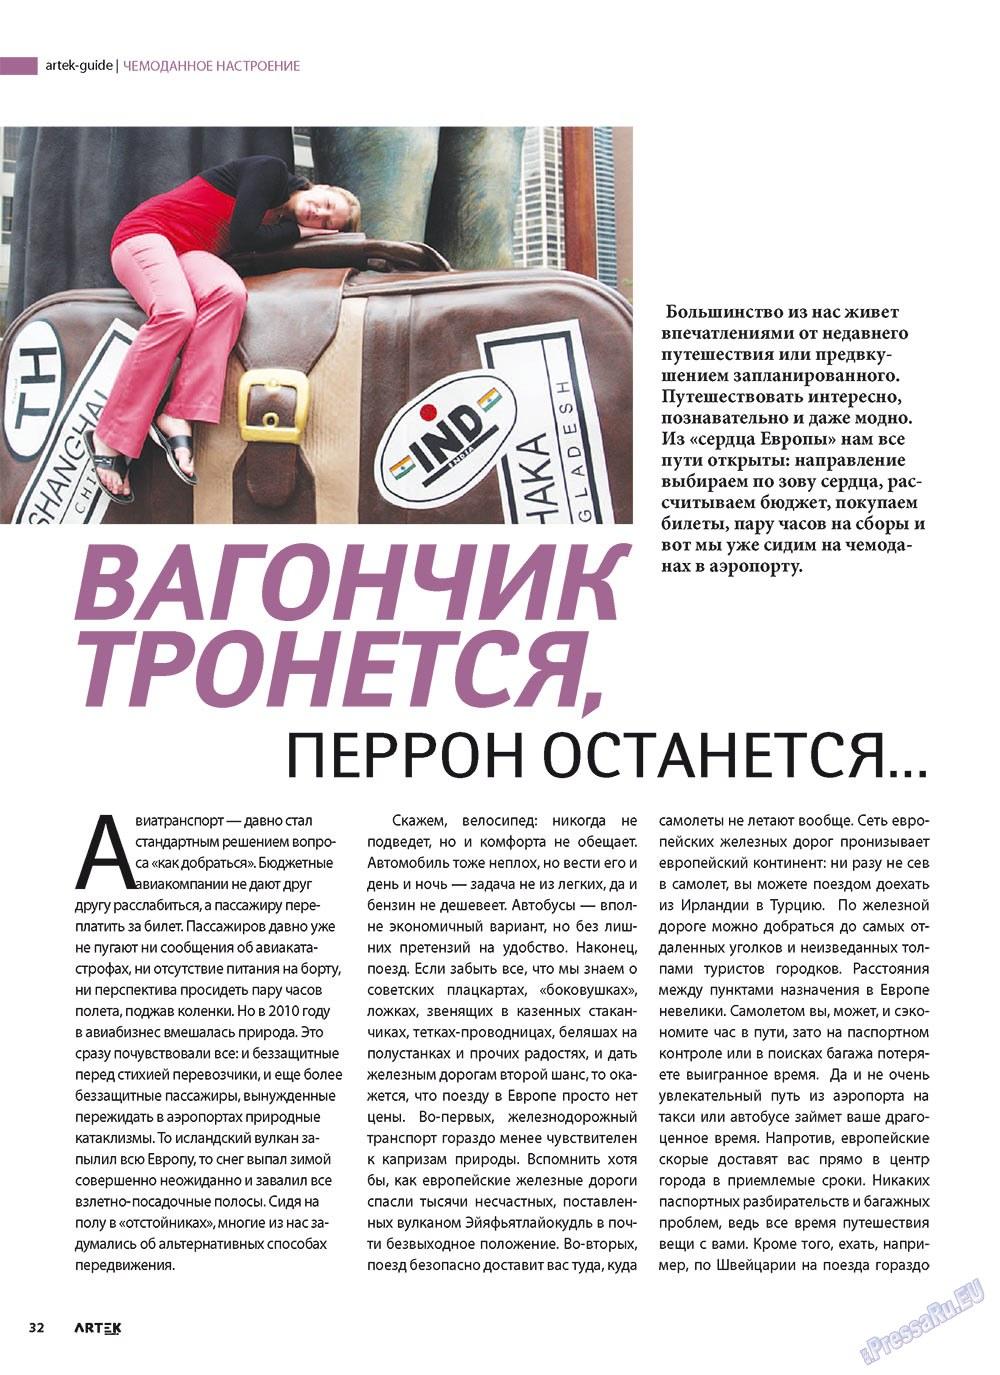 Артек (журнал). 2011 год, номер 1, стр. 34